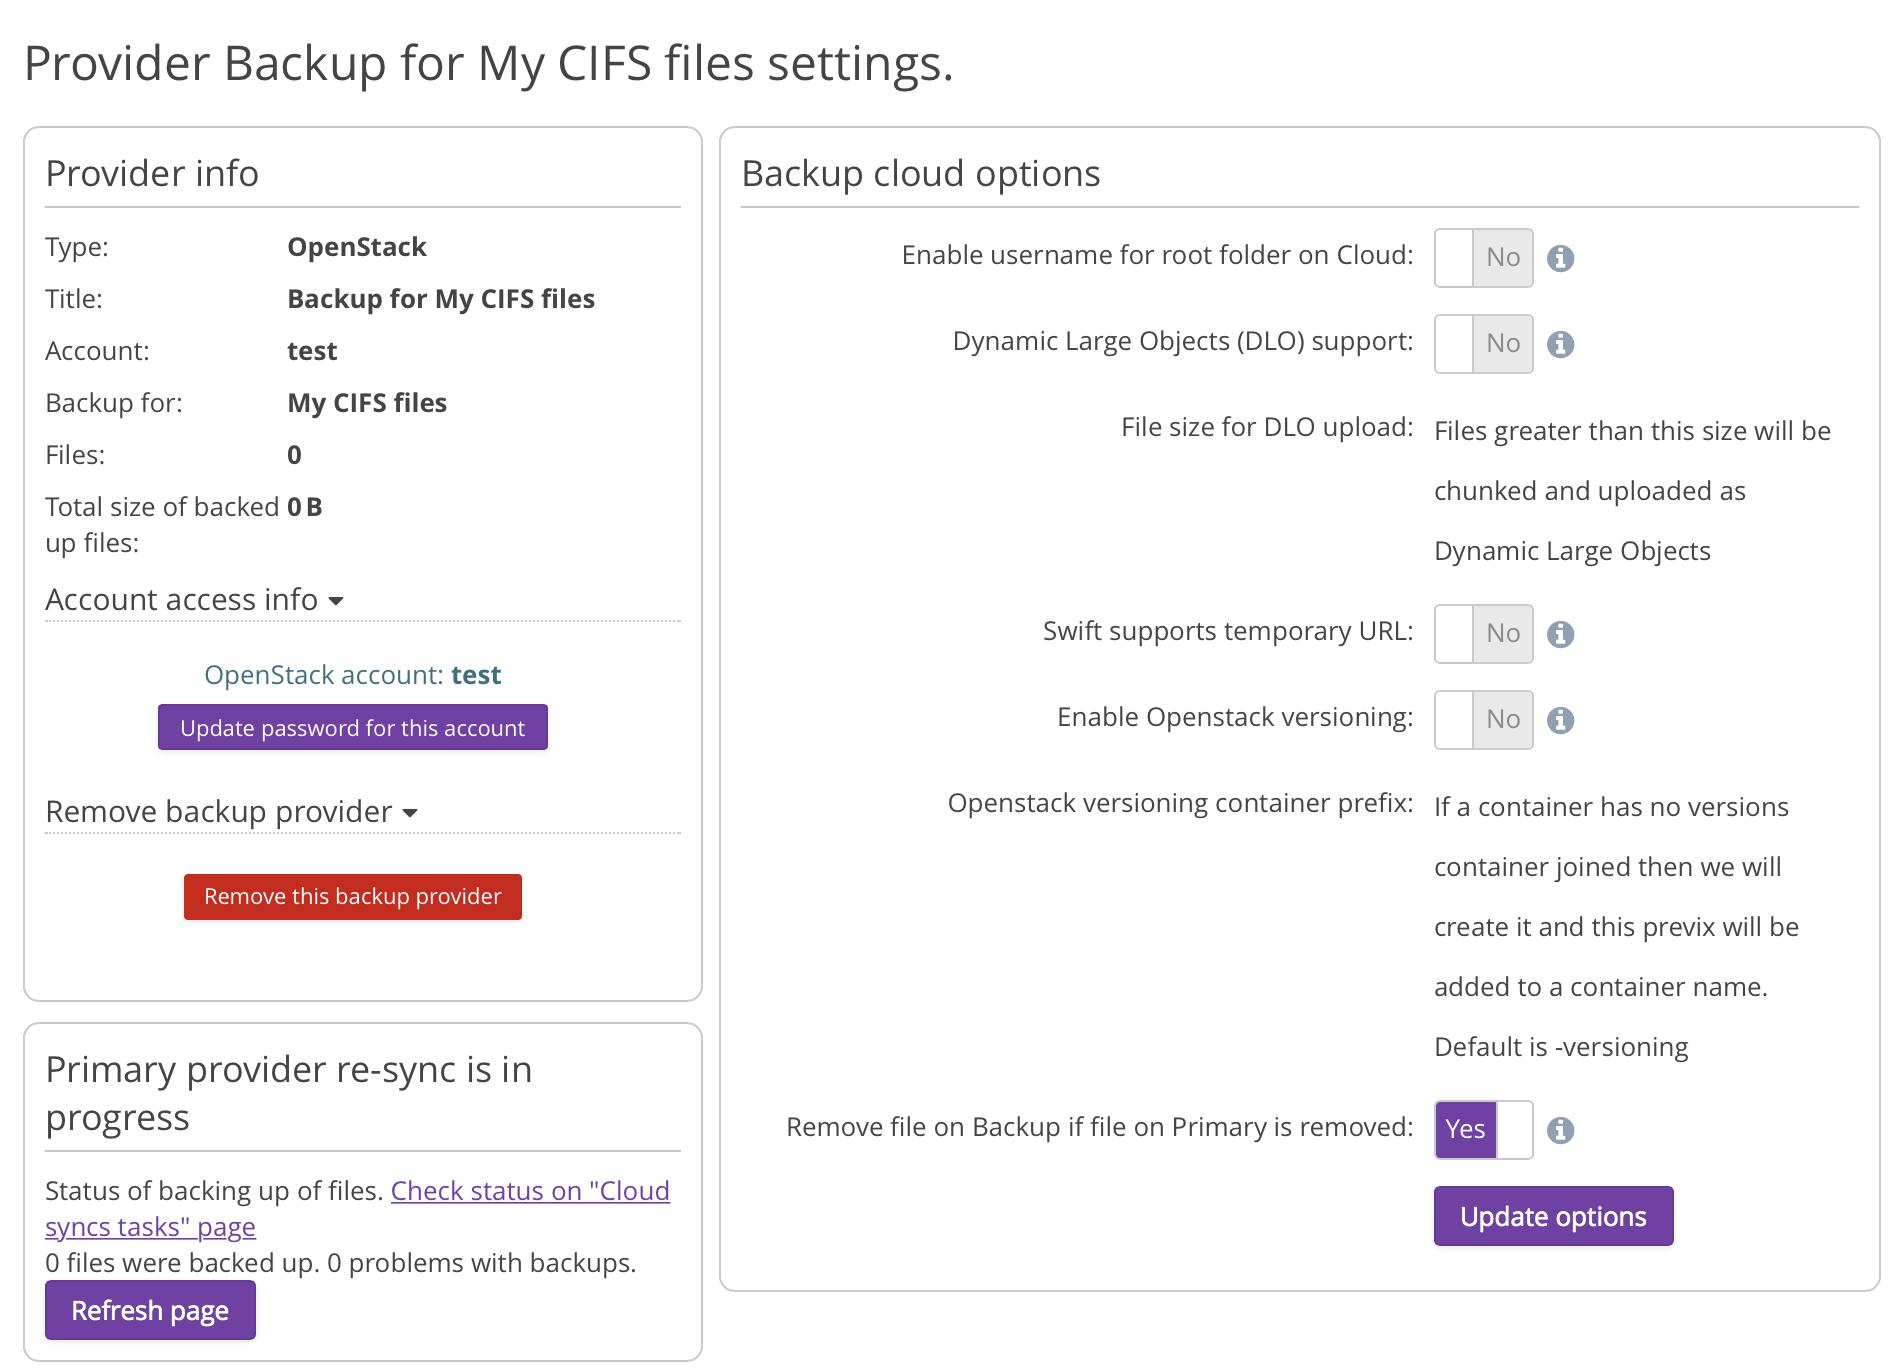 OpenStack CIFS Backup